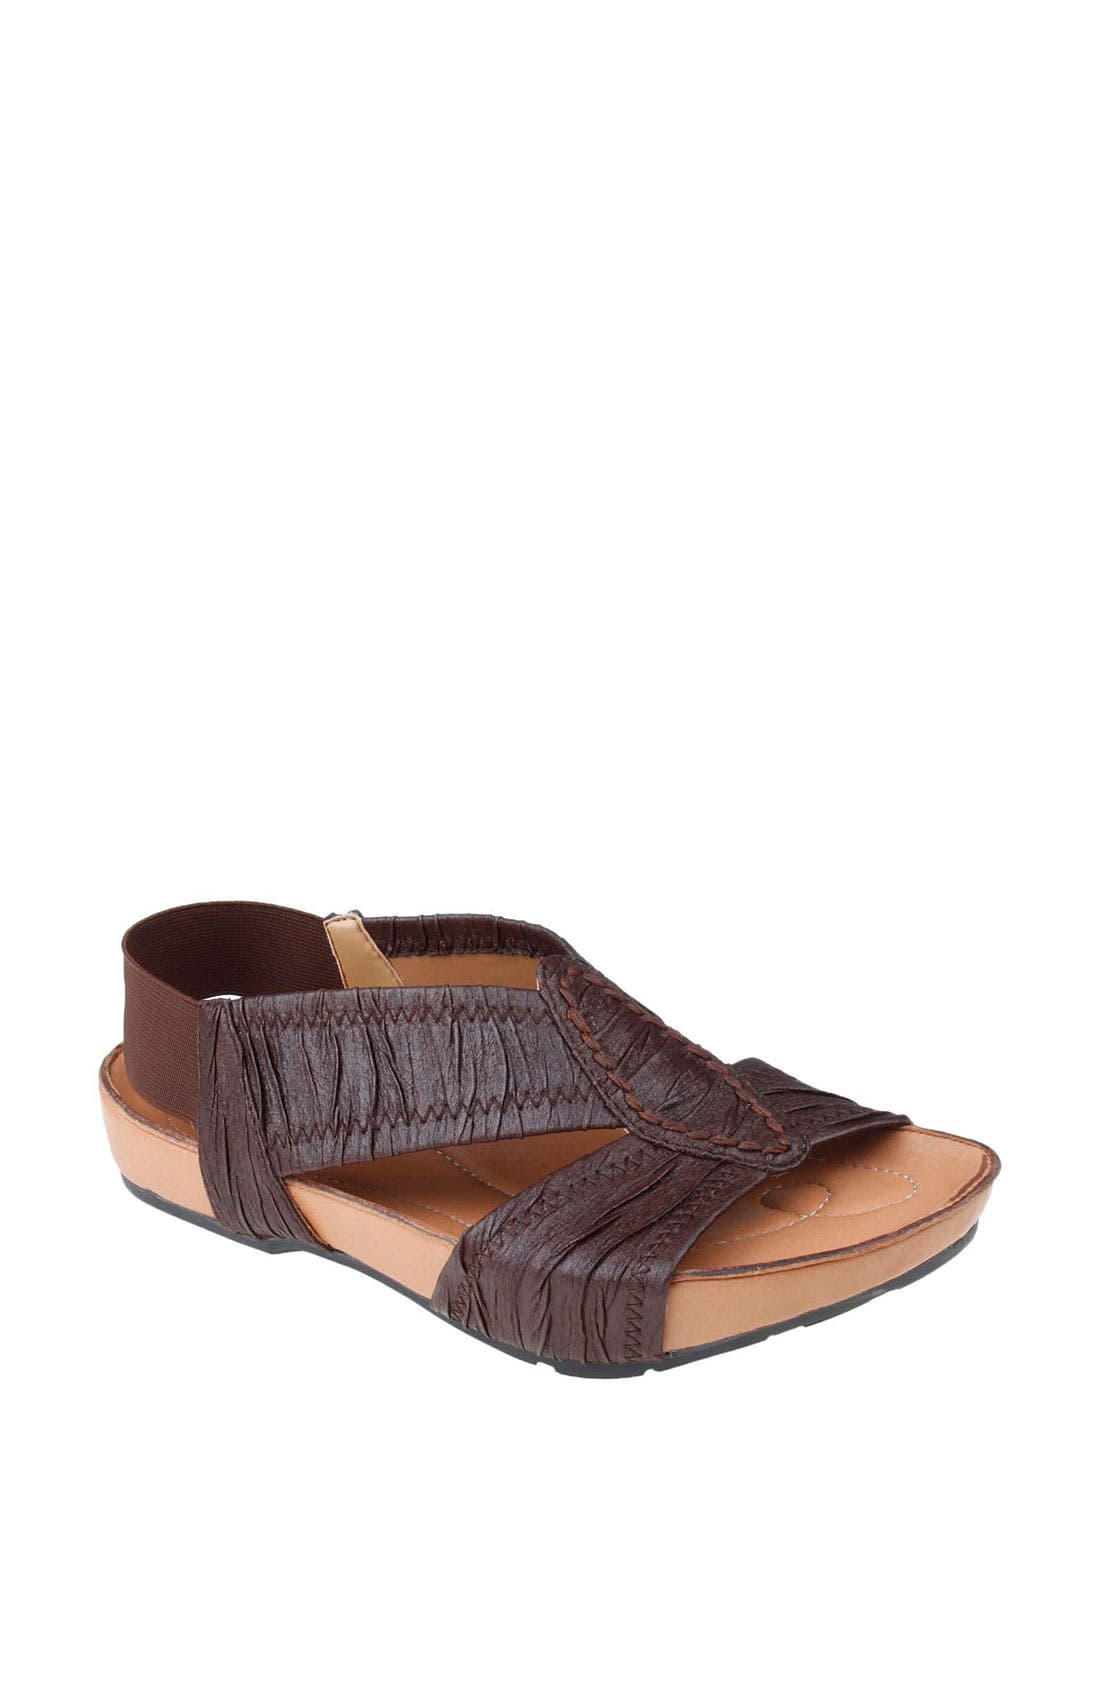 Main Image - Kalso Earth® 'Enrapture' Sandal